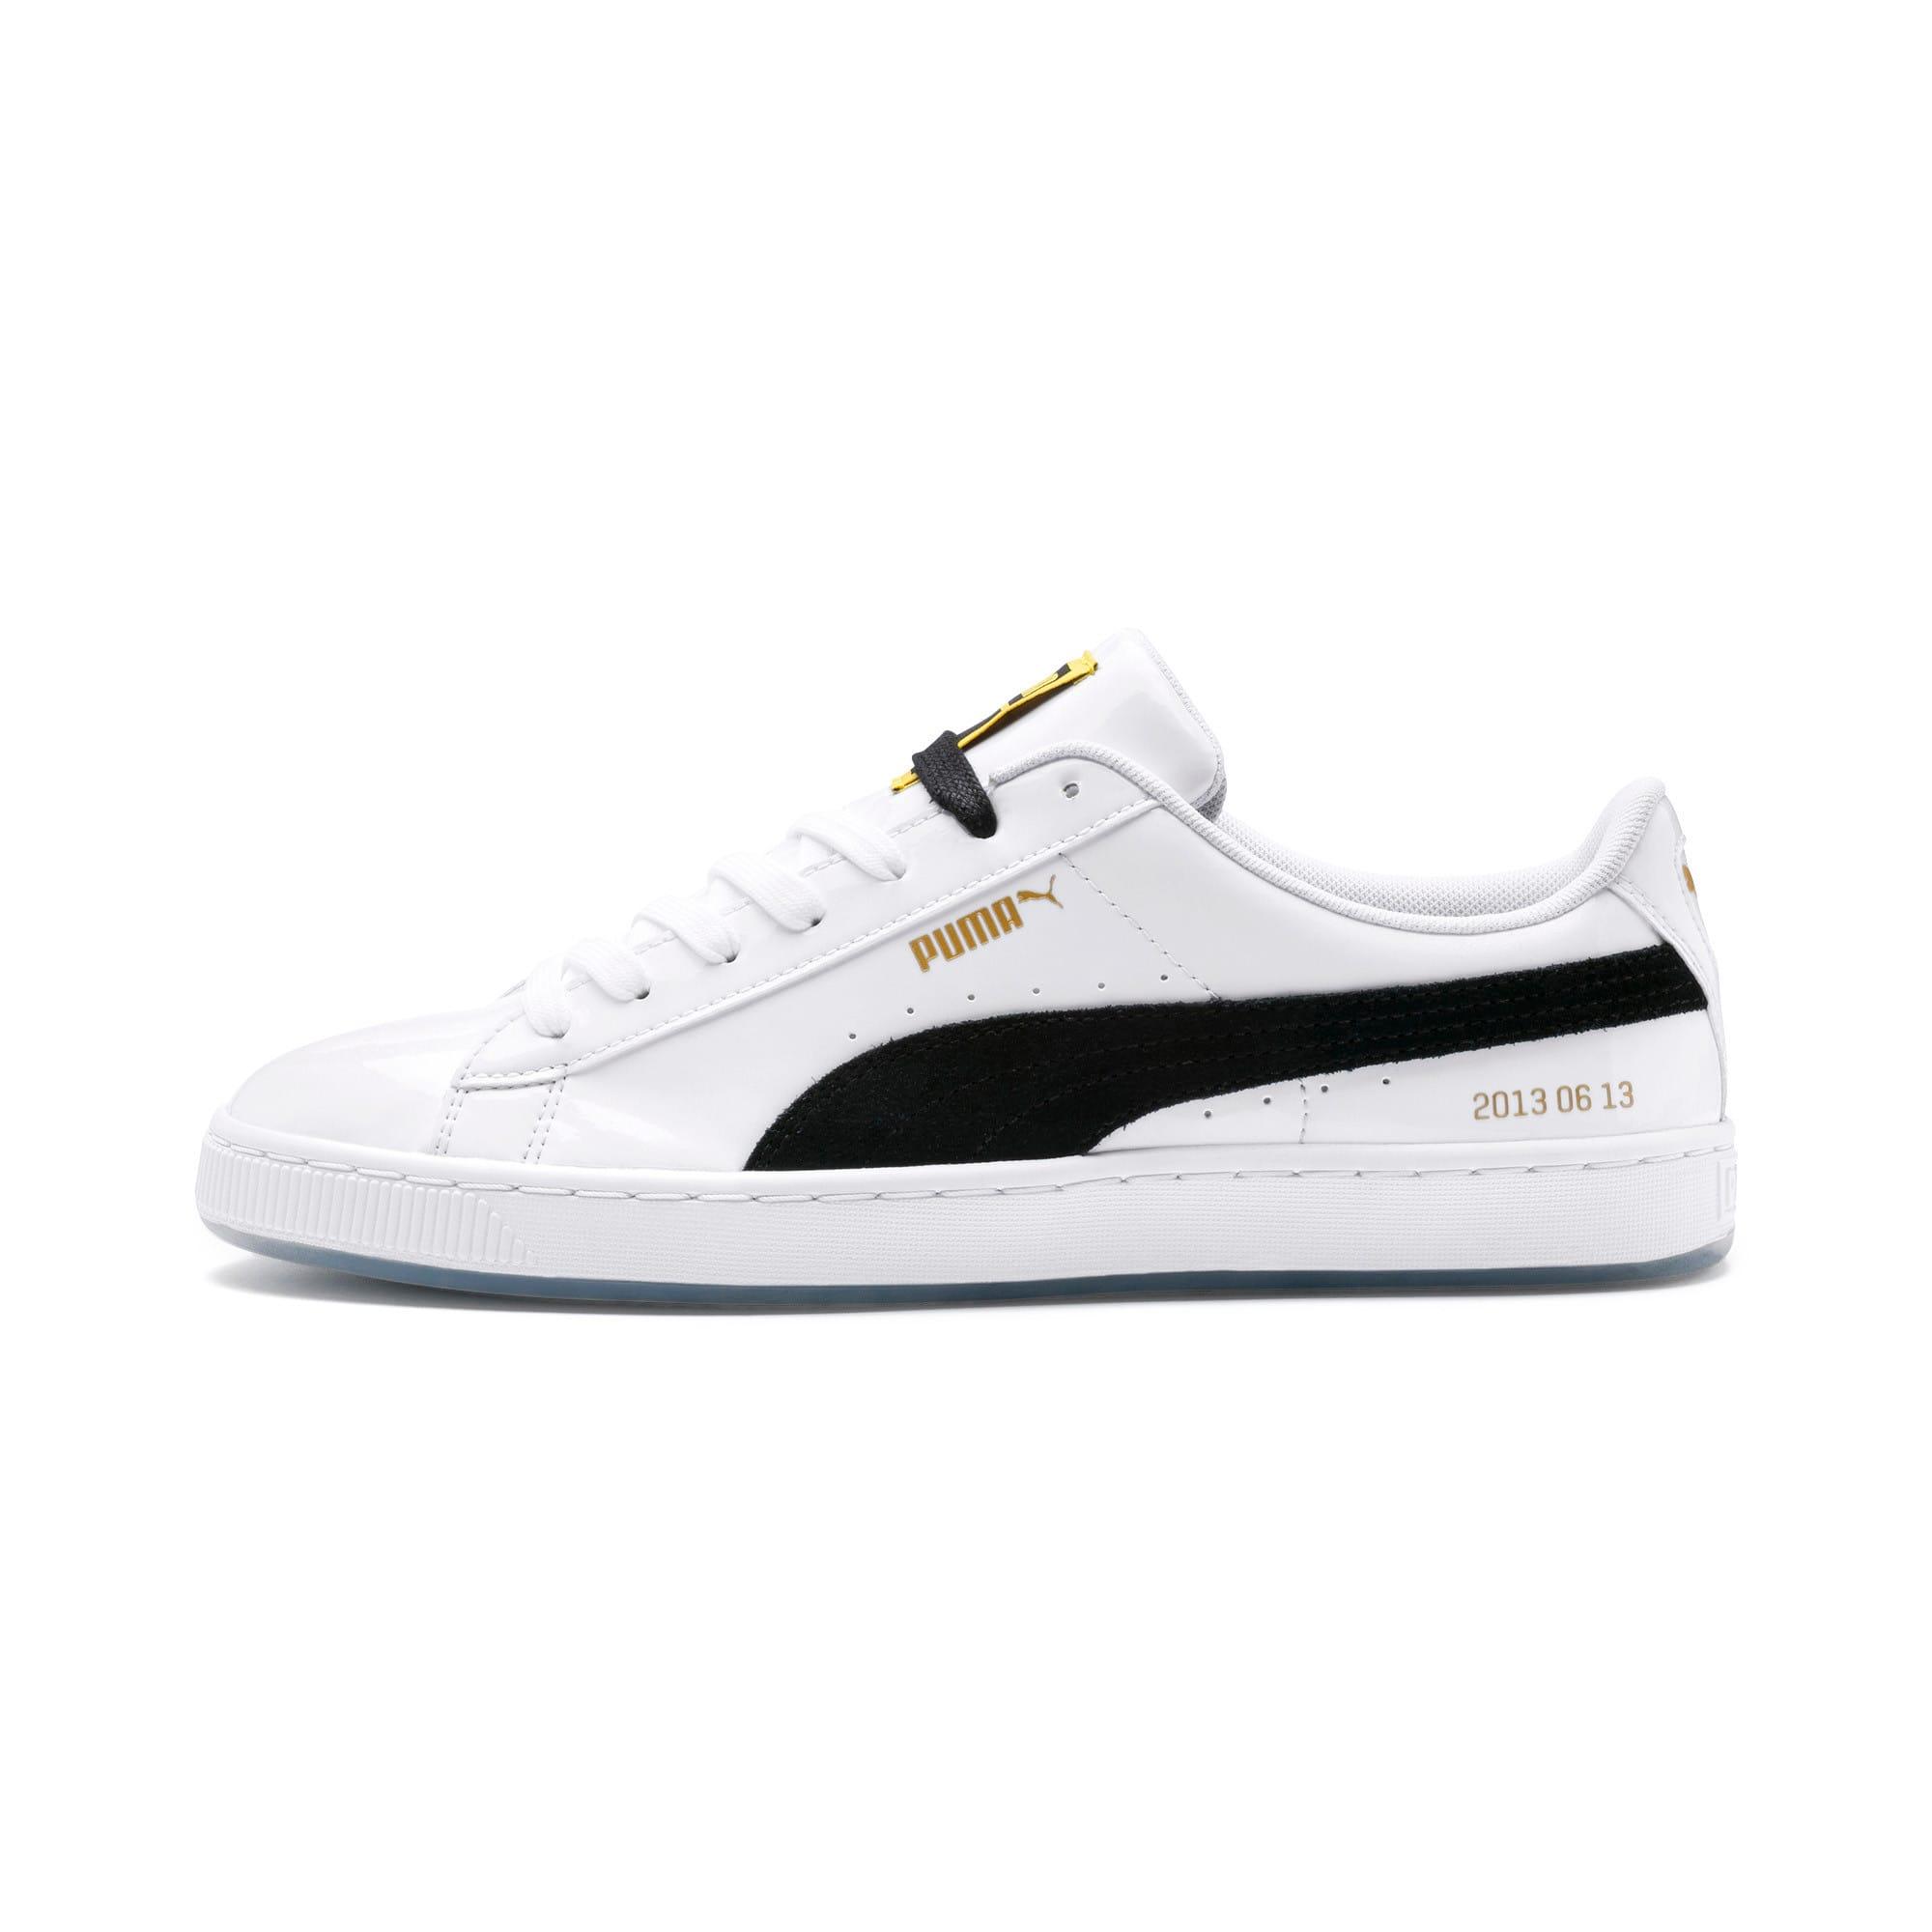 premium selection e1dda 92e8d PUMA x BTS Basket Patent Sneakers